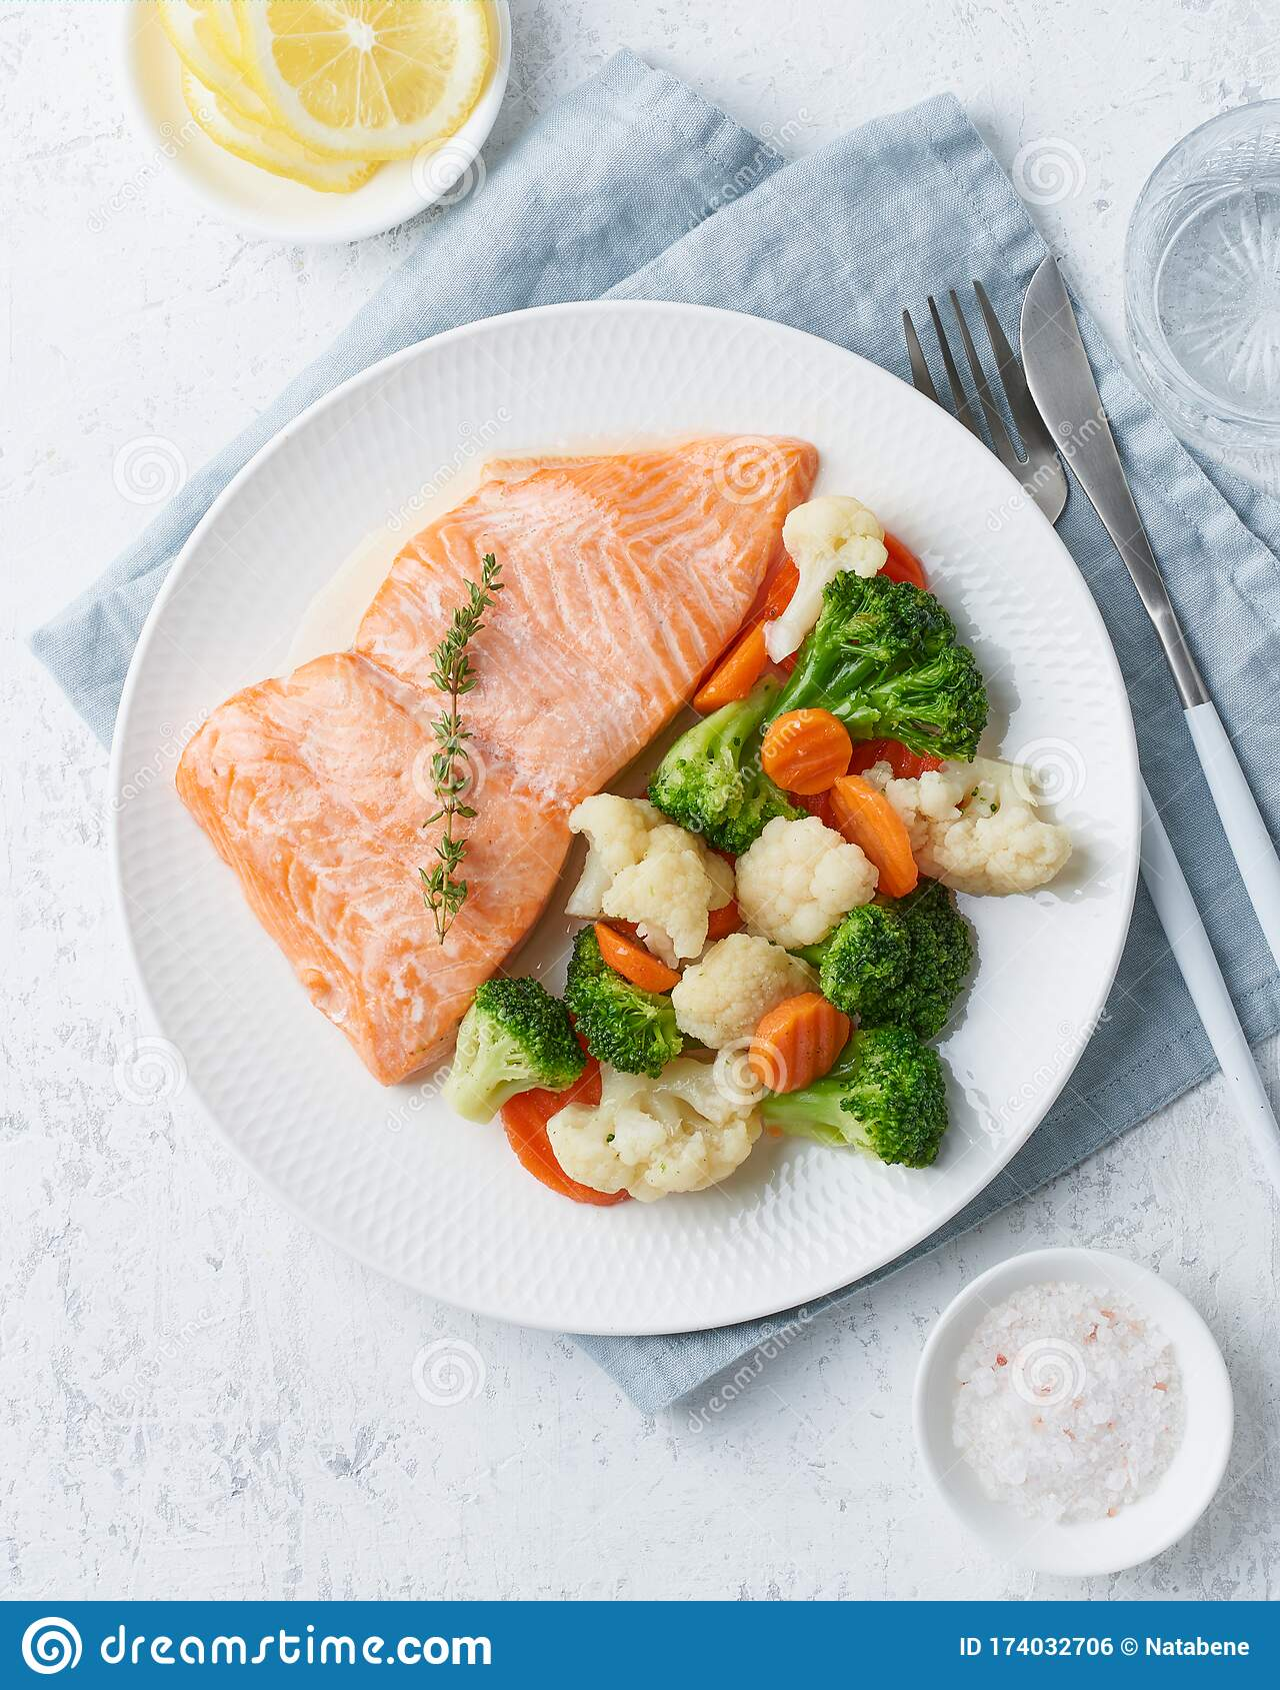 dash diet fishermans platter recipe